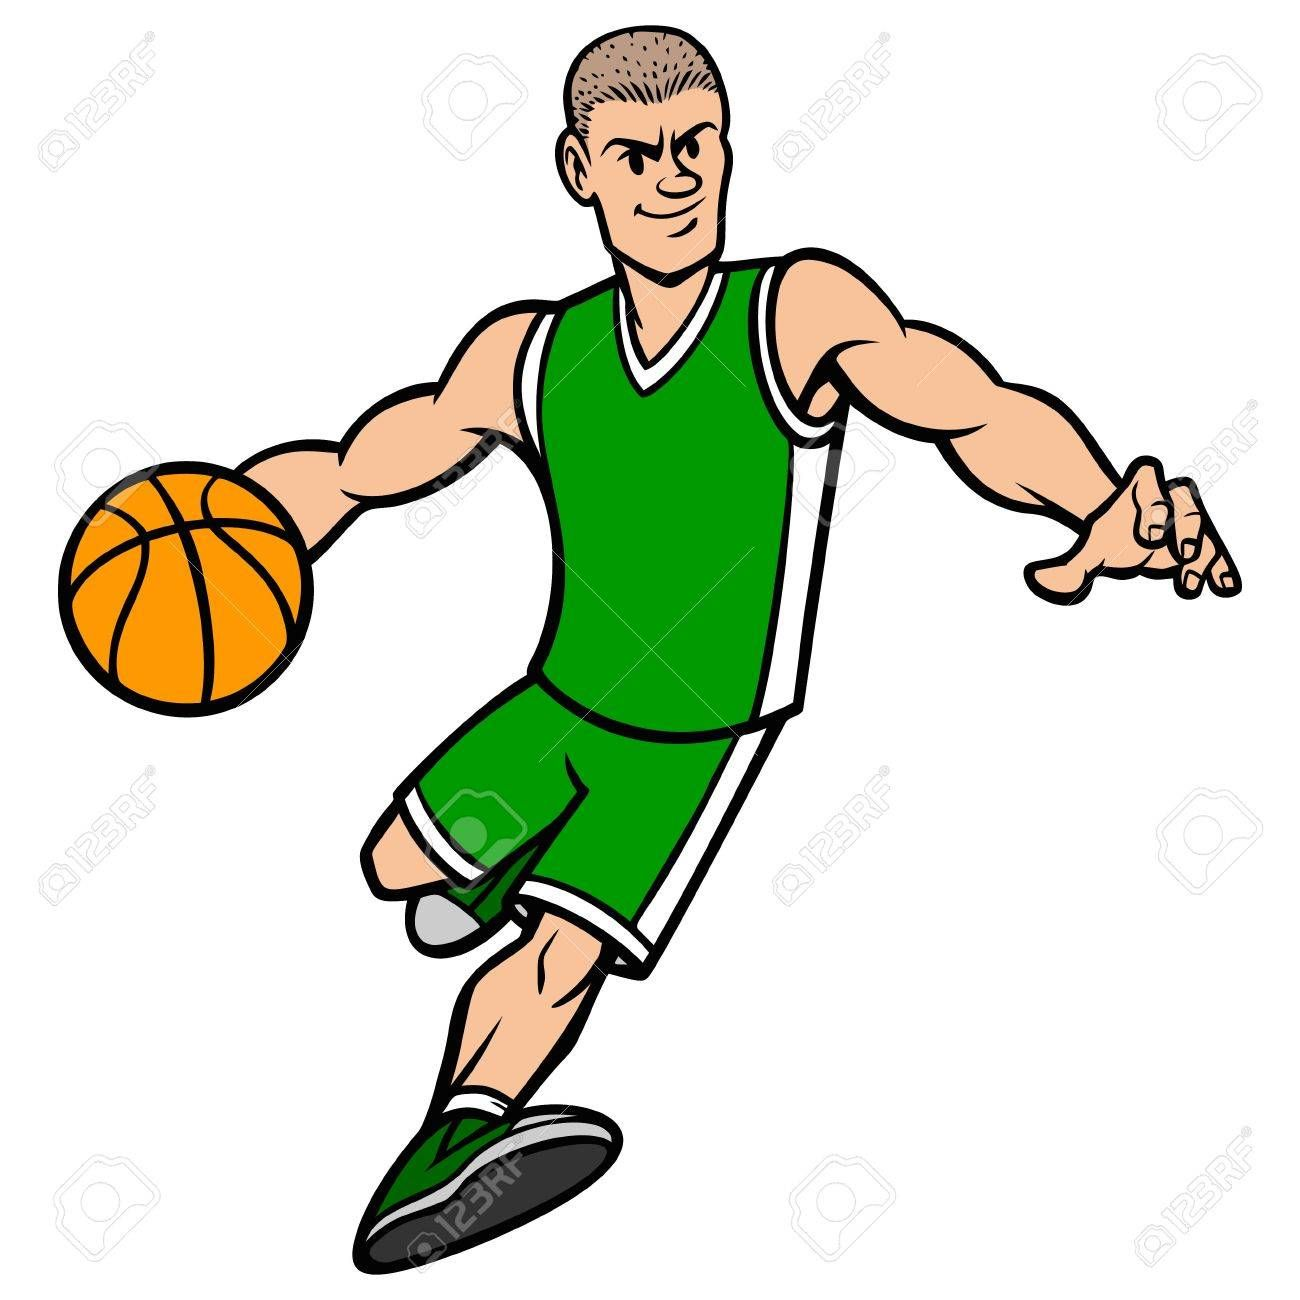 Basketball Player Dribbling The Ball Illustration Ad Player Basketball Dribbling Illustration Ball Basketball Players Cartoon Illustration Players